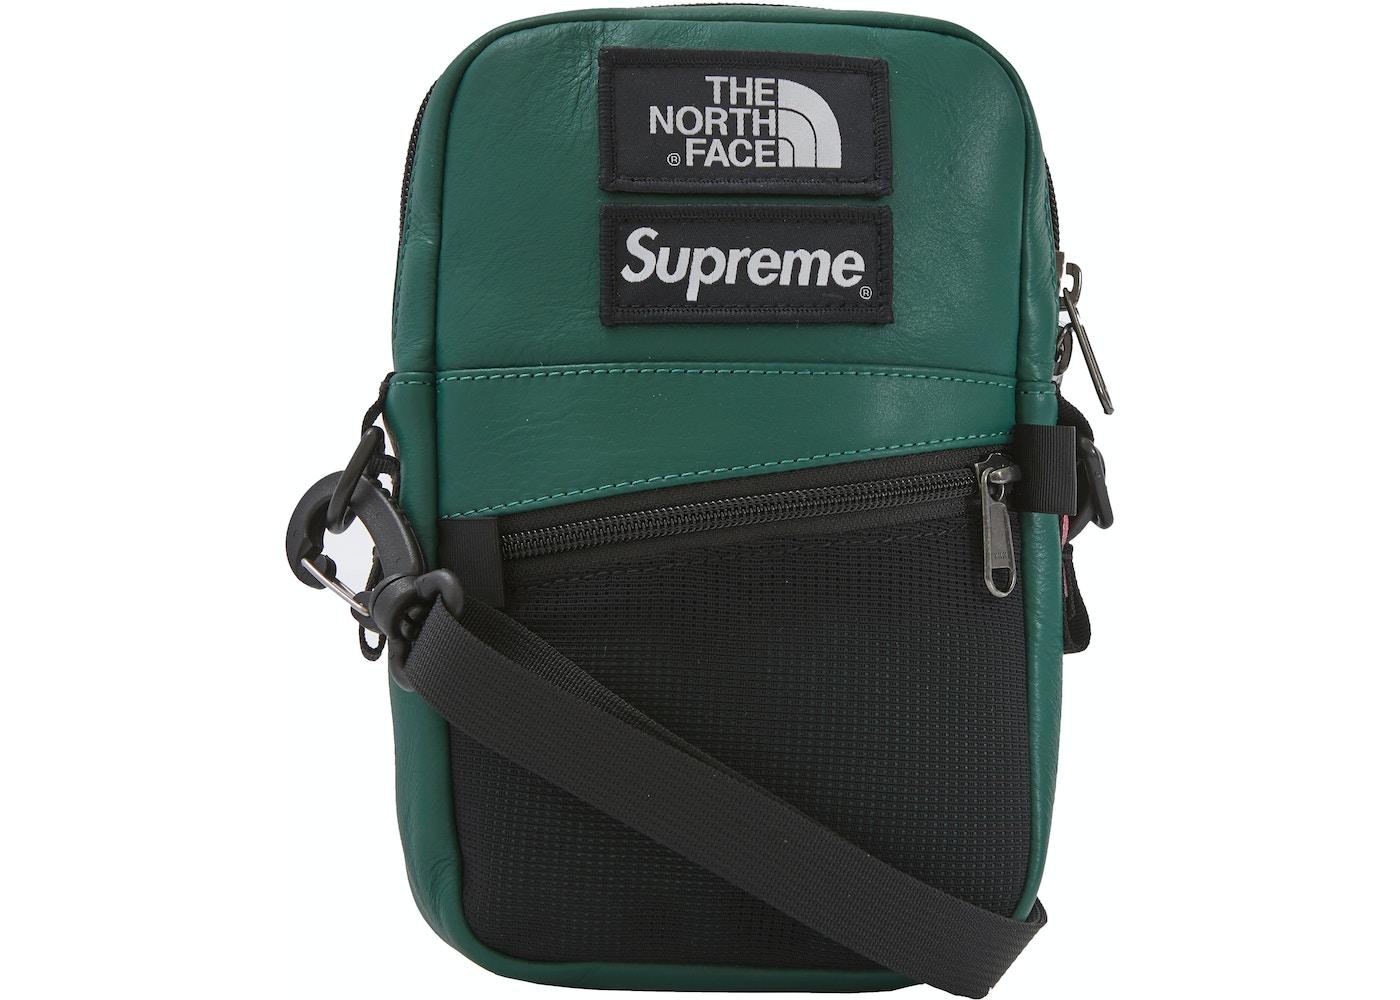 Supreme The North Face Leather Shoulder